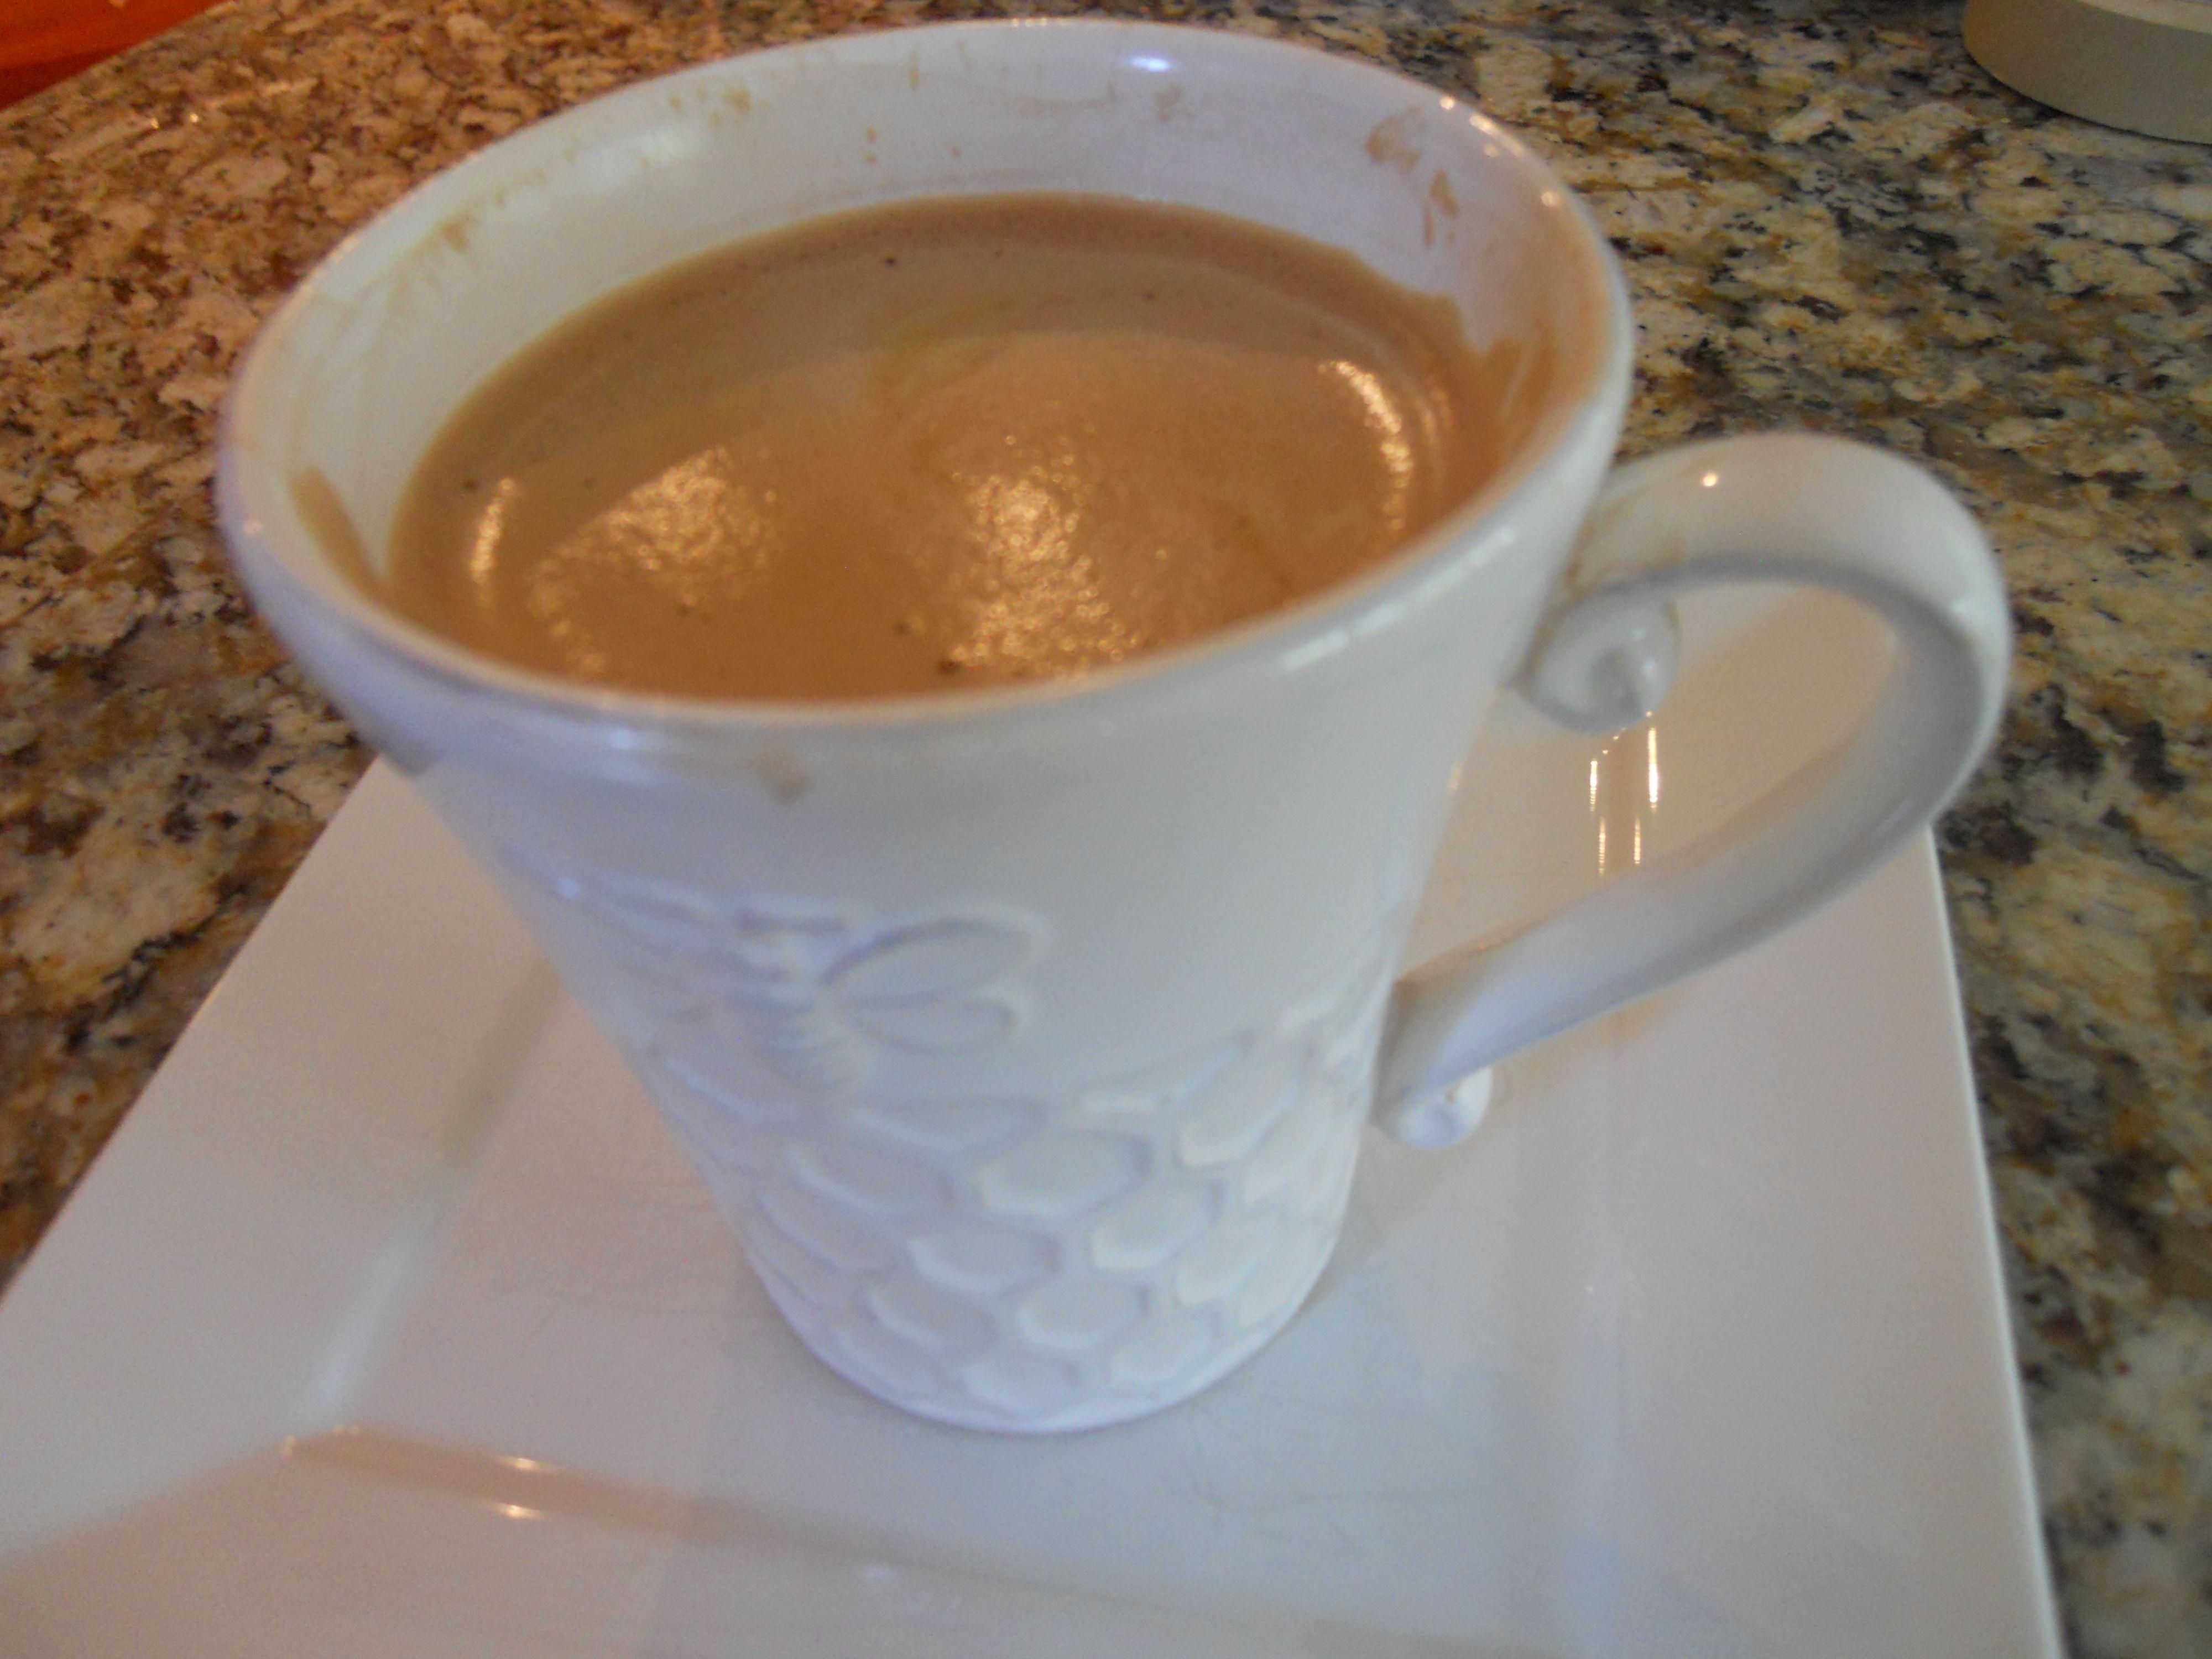 How to make the best cafe mocha with a nespresso espresso